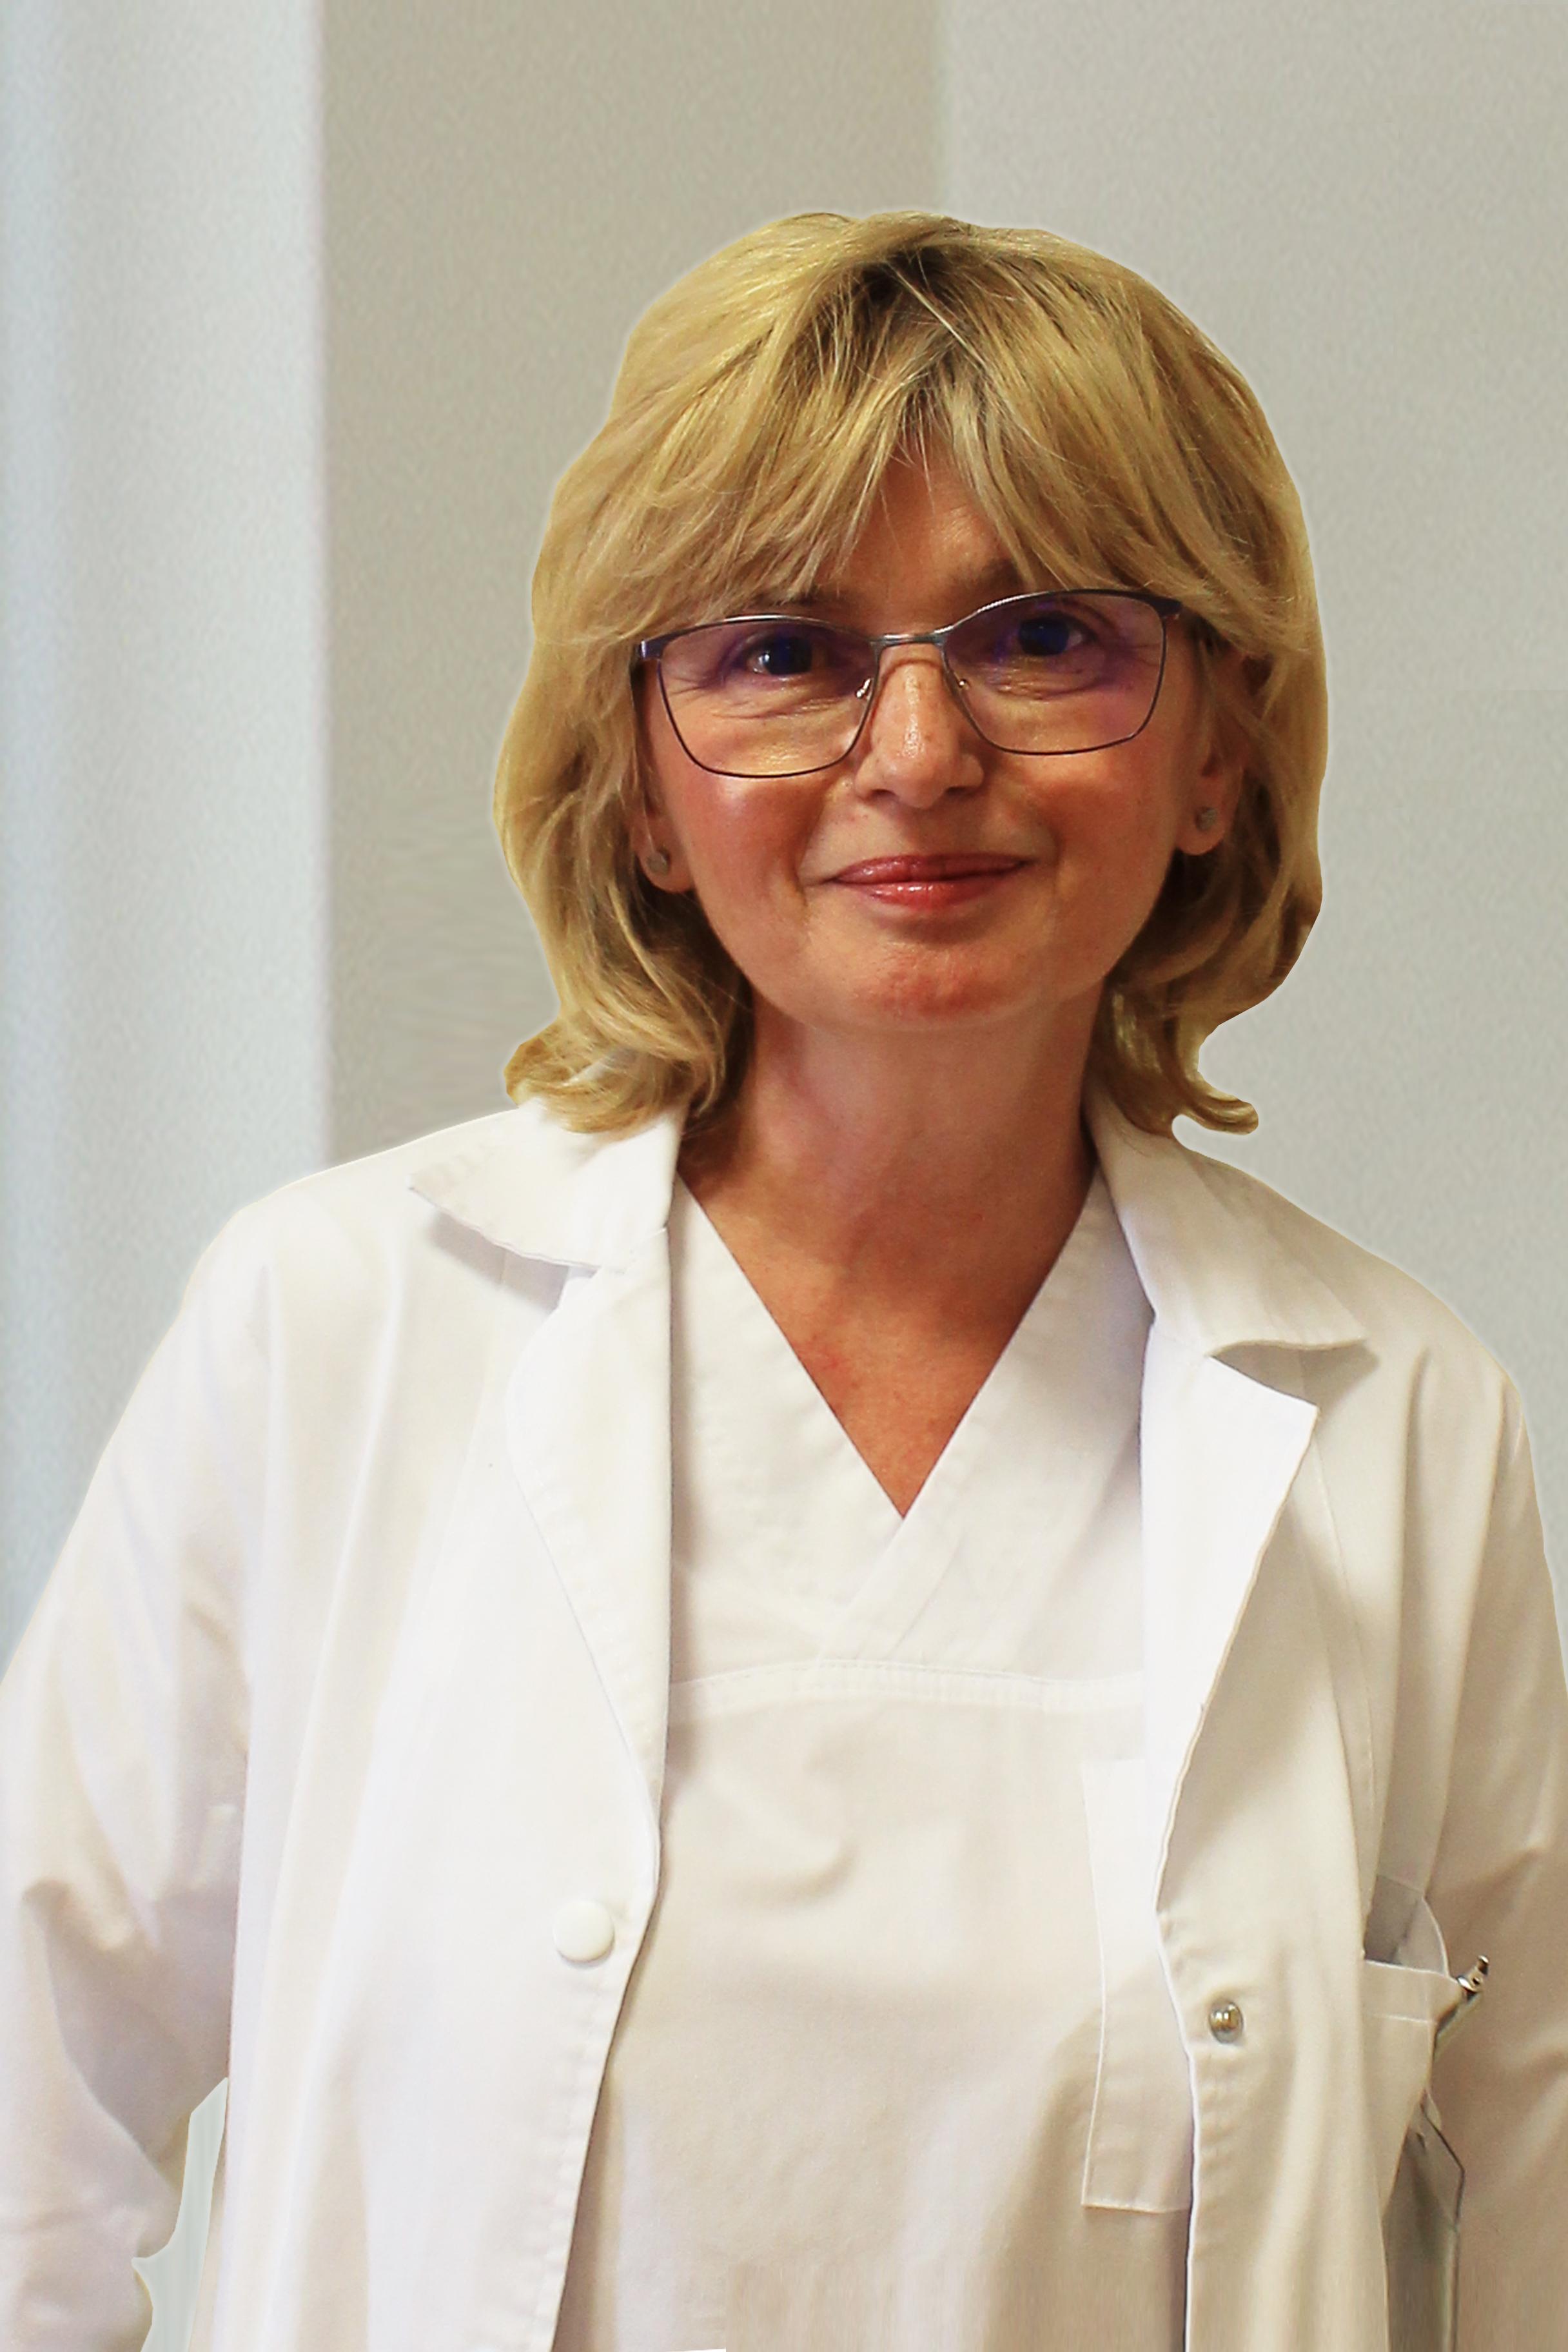 Dr. Carmen Roxana Ionascu-Fometescu